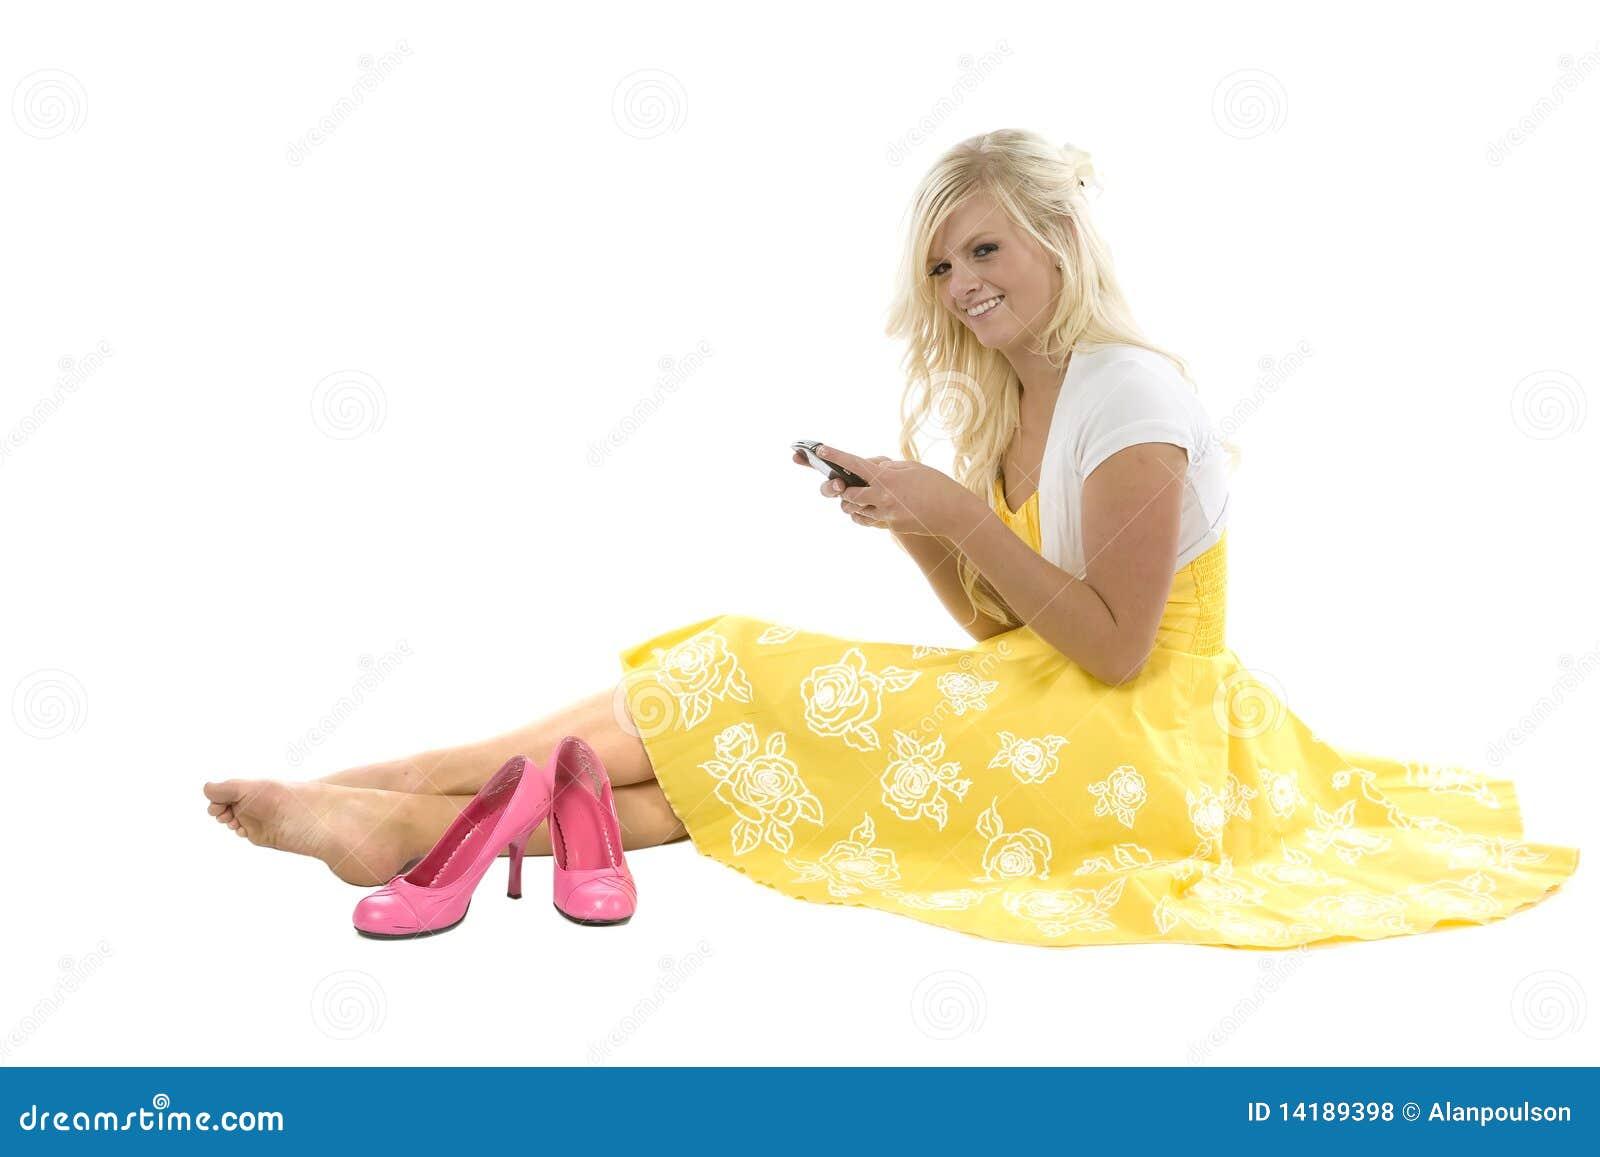 Girls Pink Dress Shoes